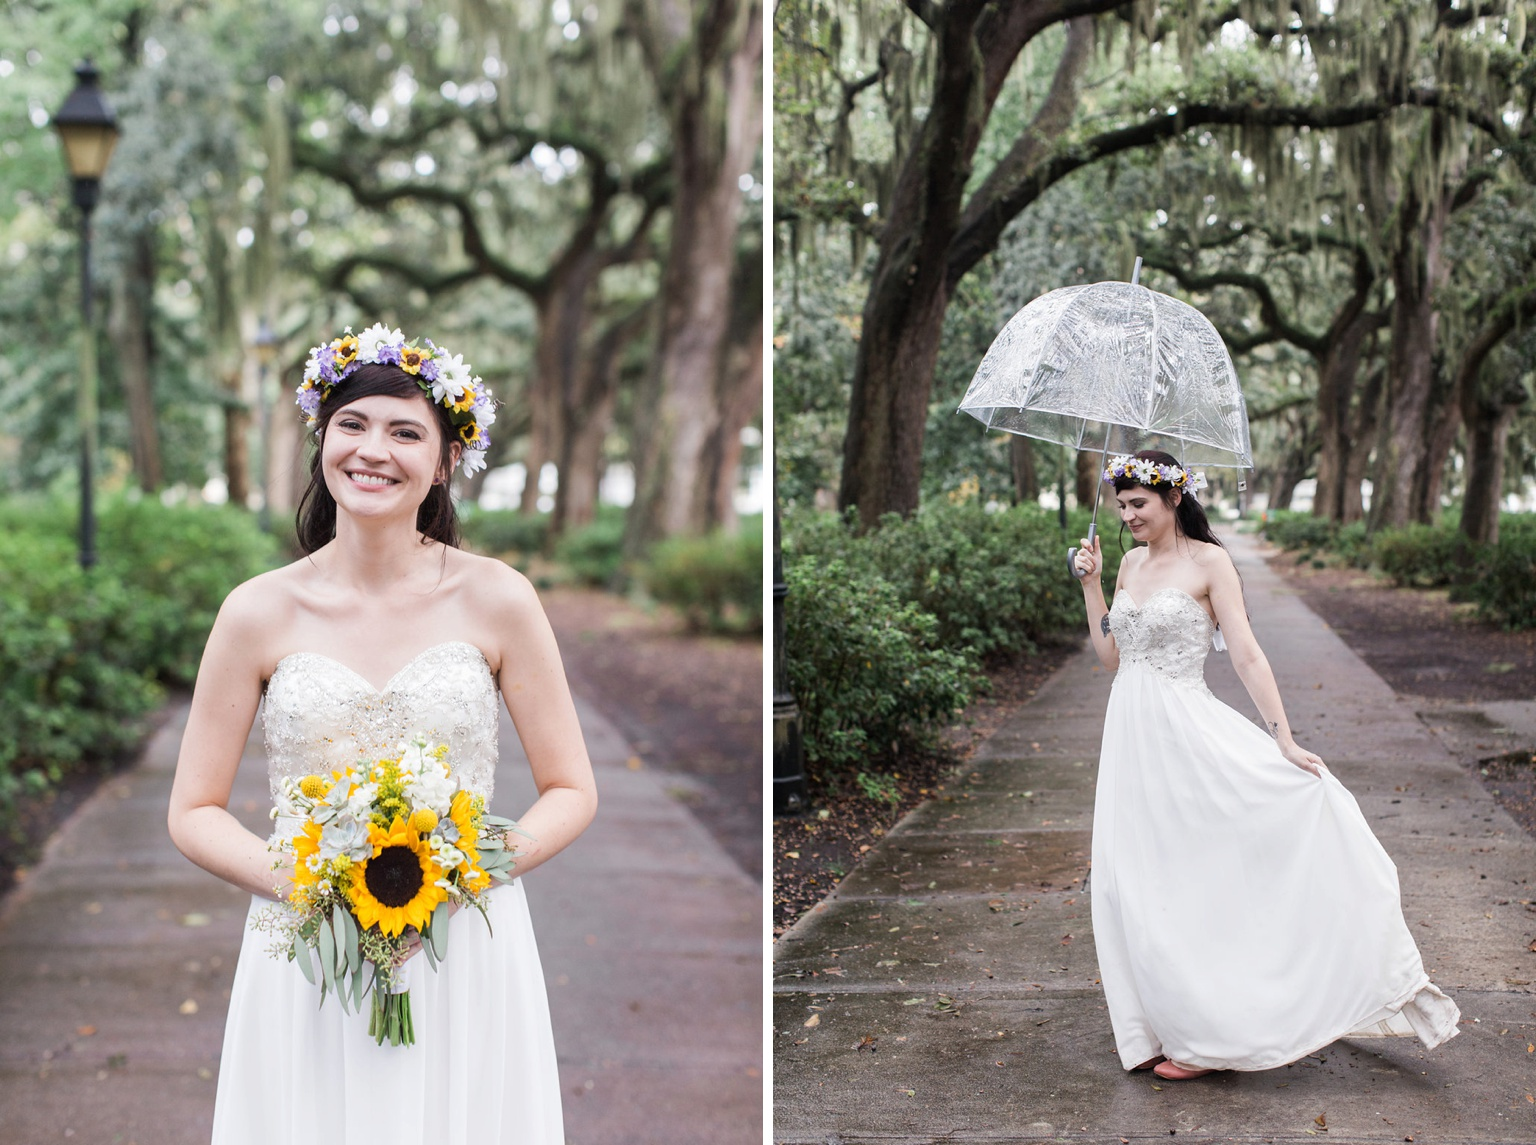 Apt_B_Photo_Savannah_Wedding_Photographer_Flower_Crown054.JPG